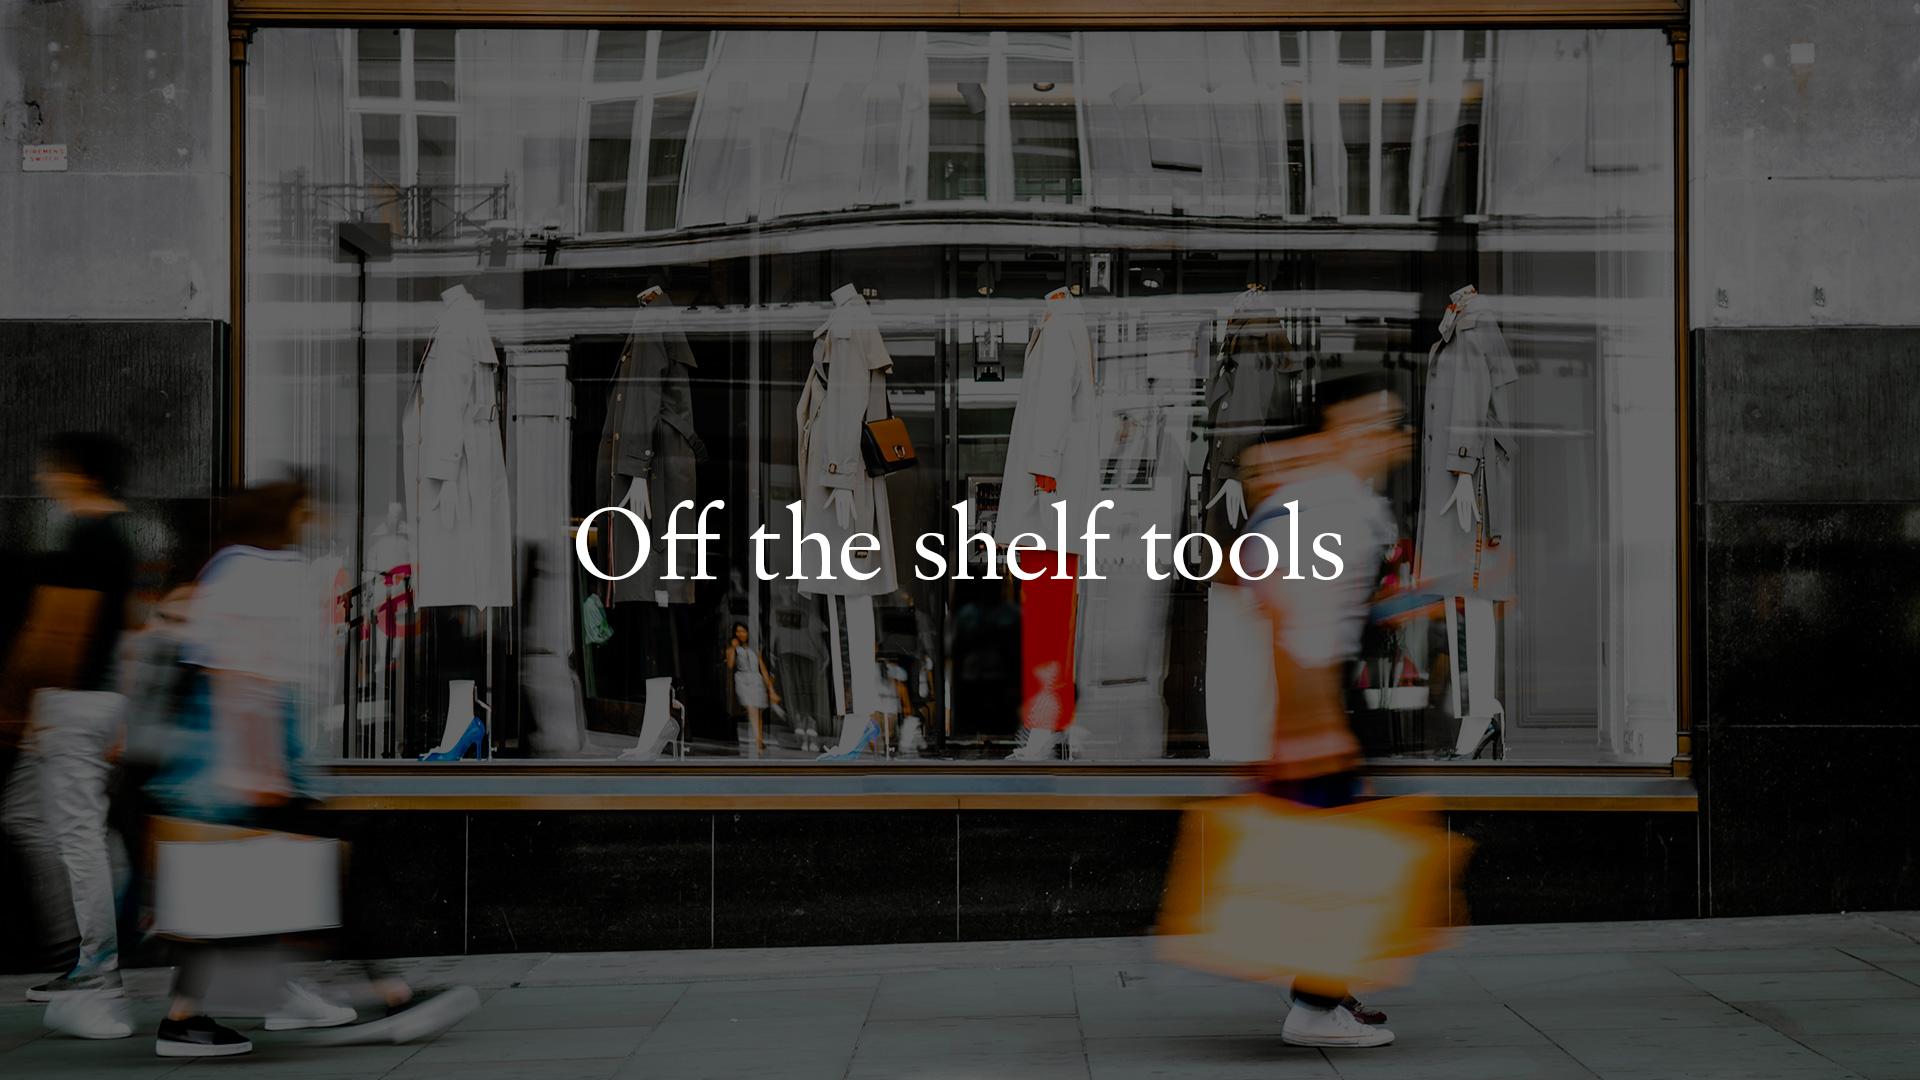 Corona Protection Tools, Schutzmaßnahmen, Retail Lösungen, Social Distancing, New Retail Reality, Kassenlösungen